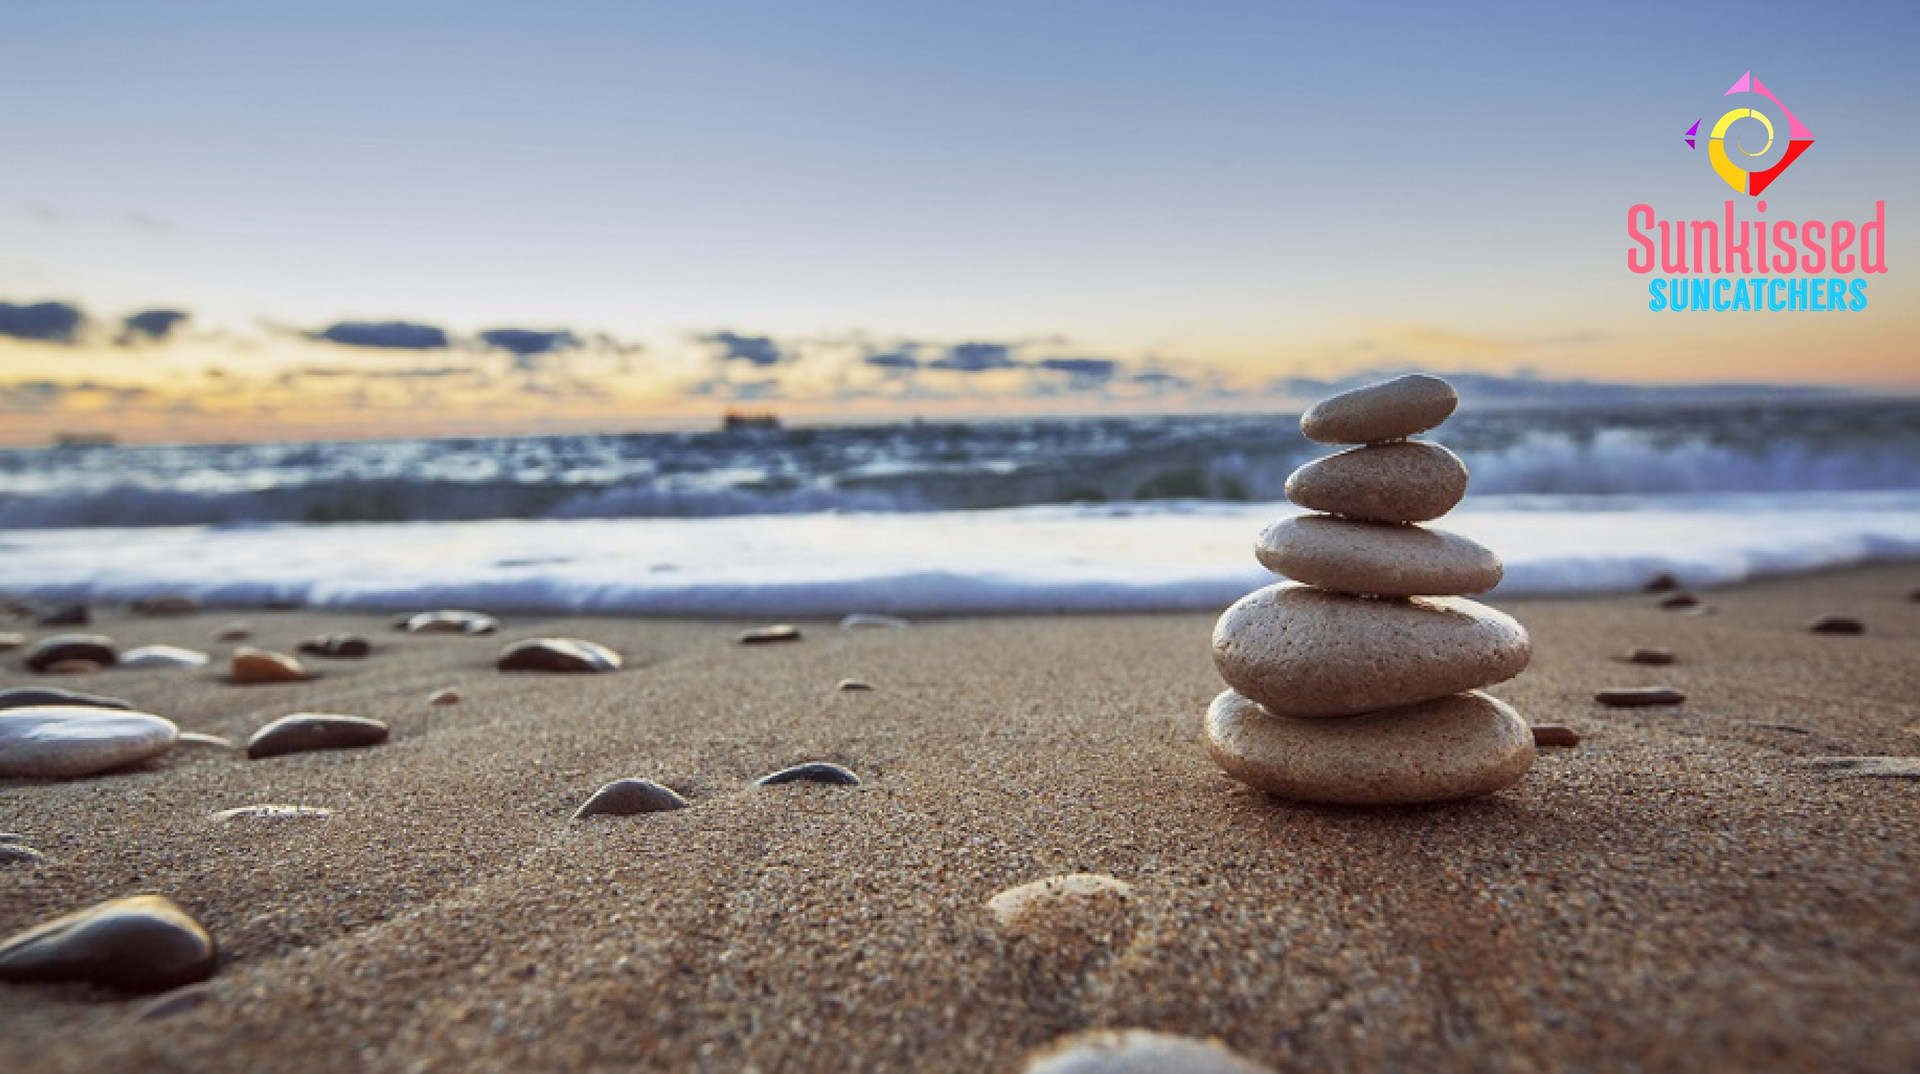 Sunkissed Suncatchers Beach Pebbles.jpg